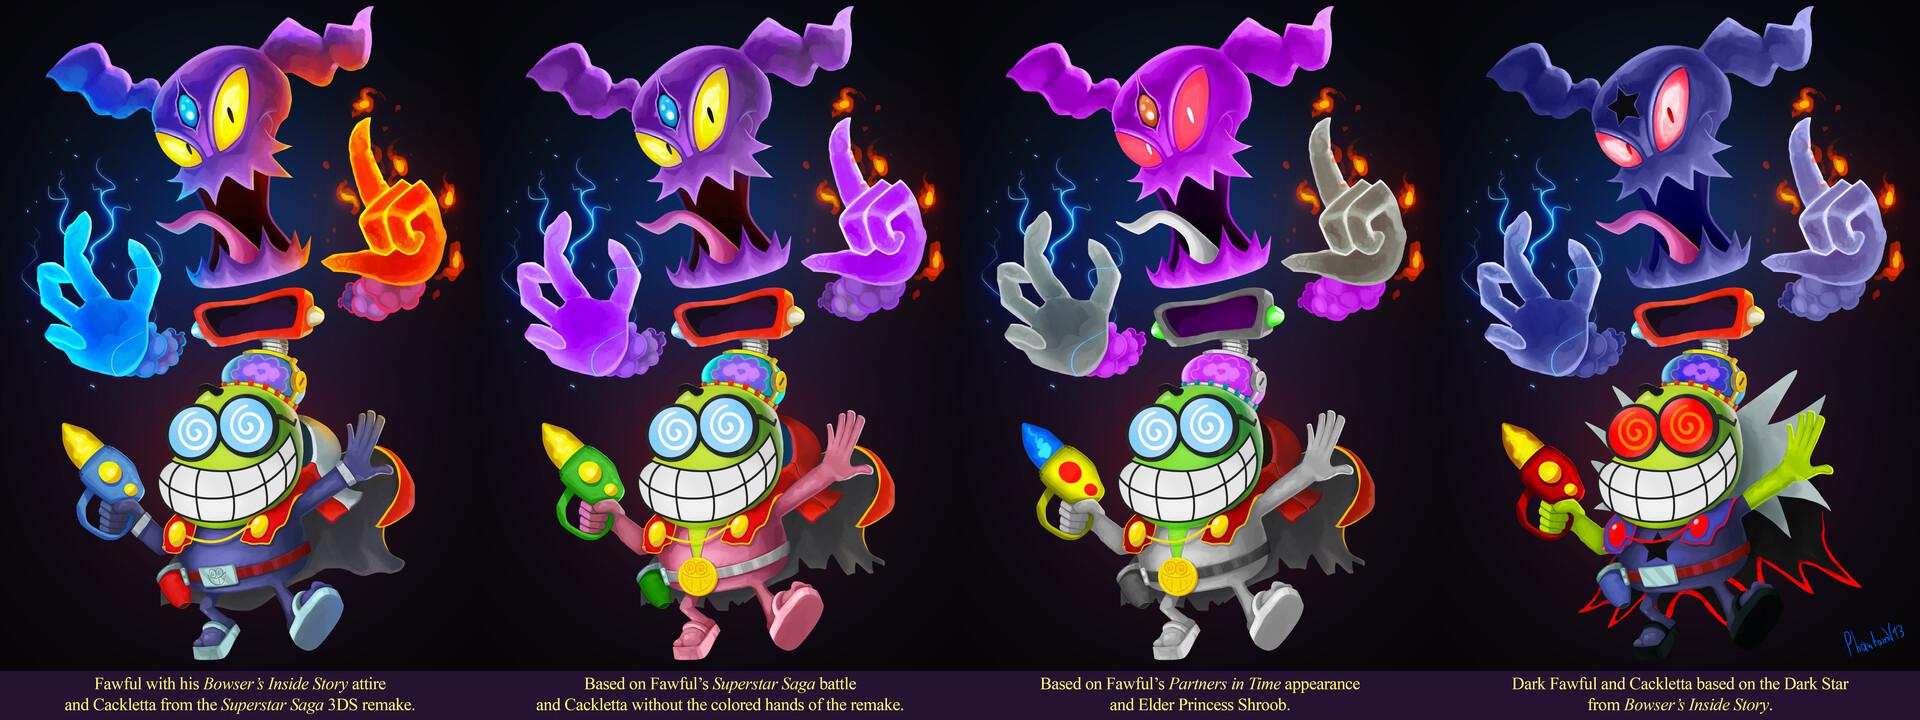 Artstation Fawful Cackletta Detailed Smash Concept